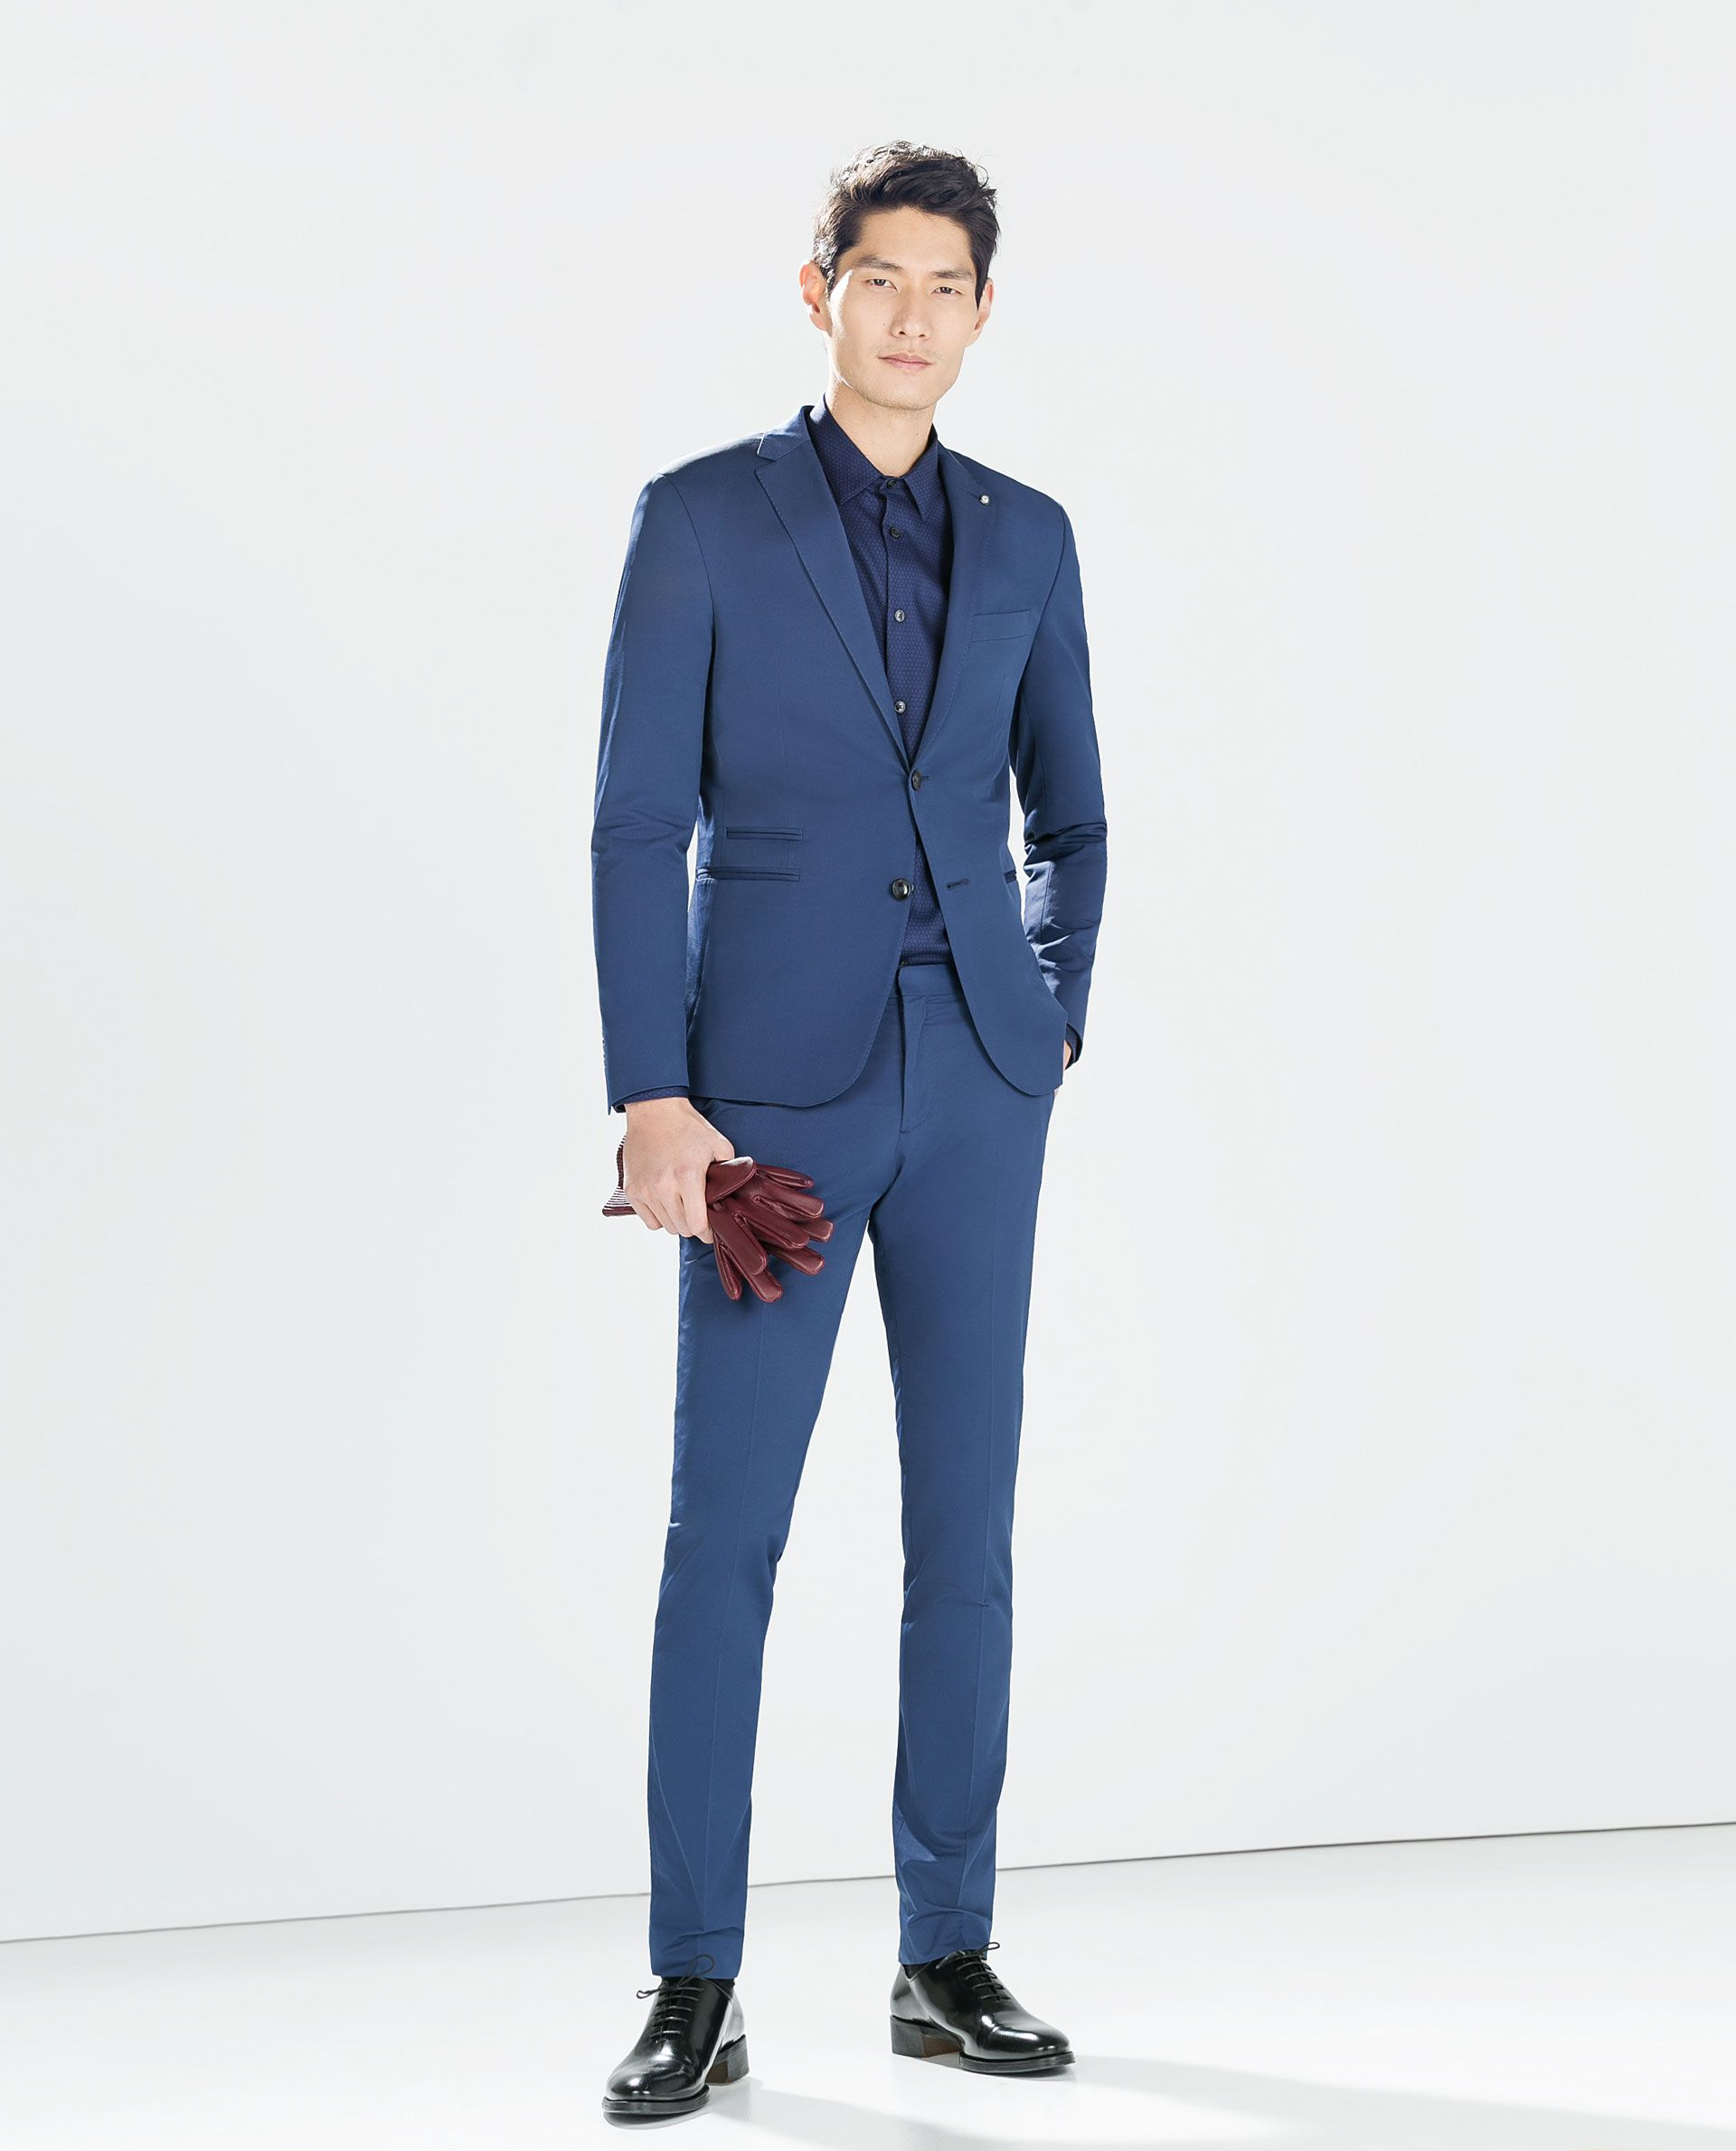 I Love Wearing Mens Clothing And I Ve Got A Girly Figure But Whateva Zara Collection Ss15 Blue Blaze Blauer Anzug Manner Dunkelblauer Anzug Paris Mode